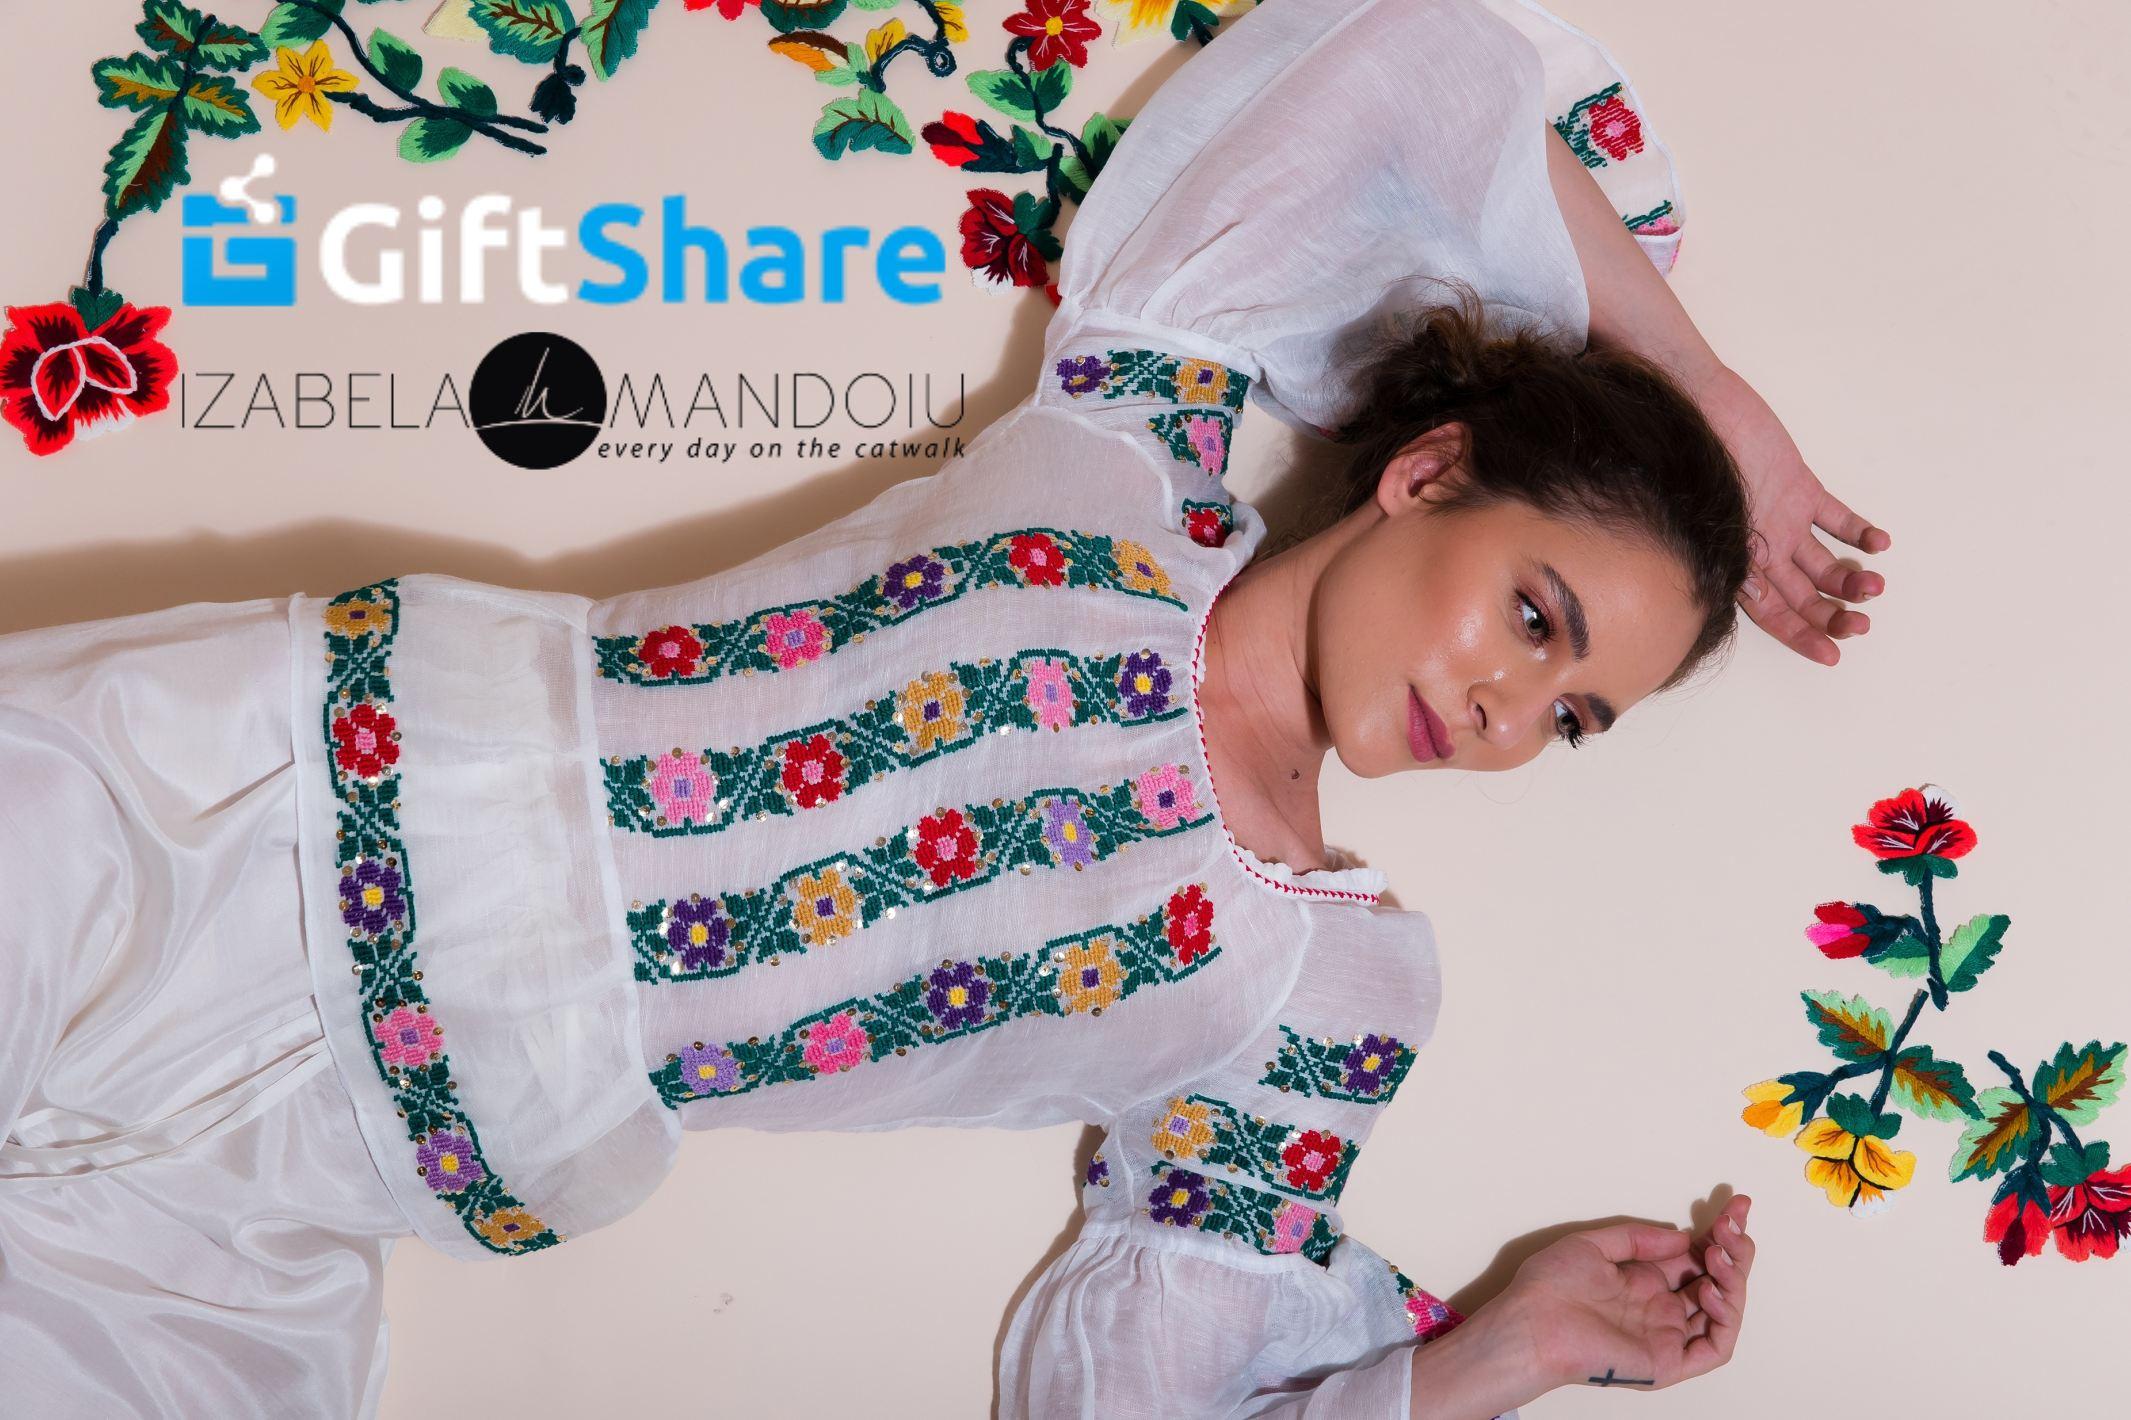 Gift share Romania - strânge suma cadou - Gift voucher online